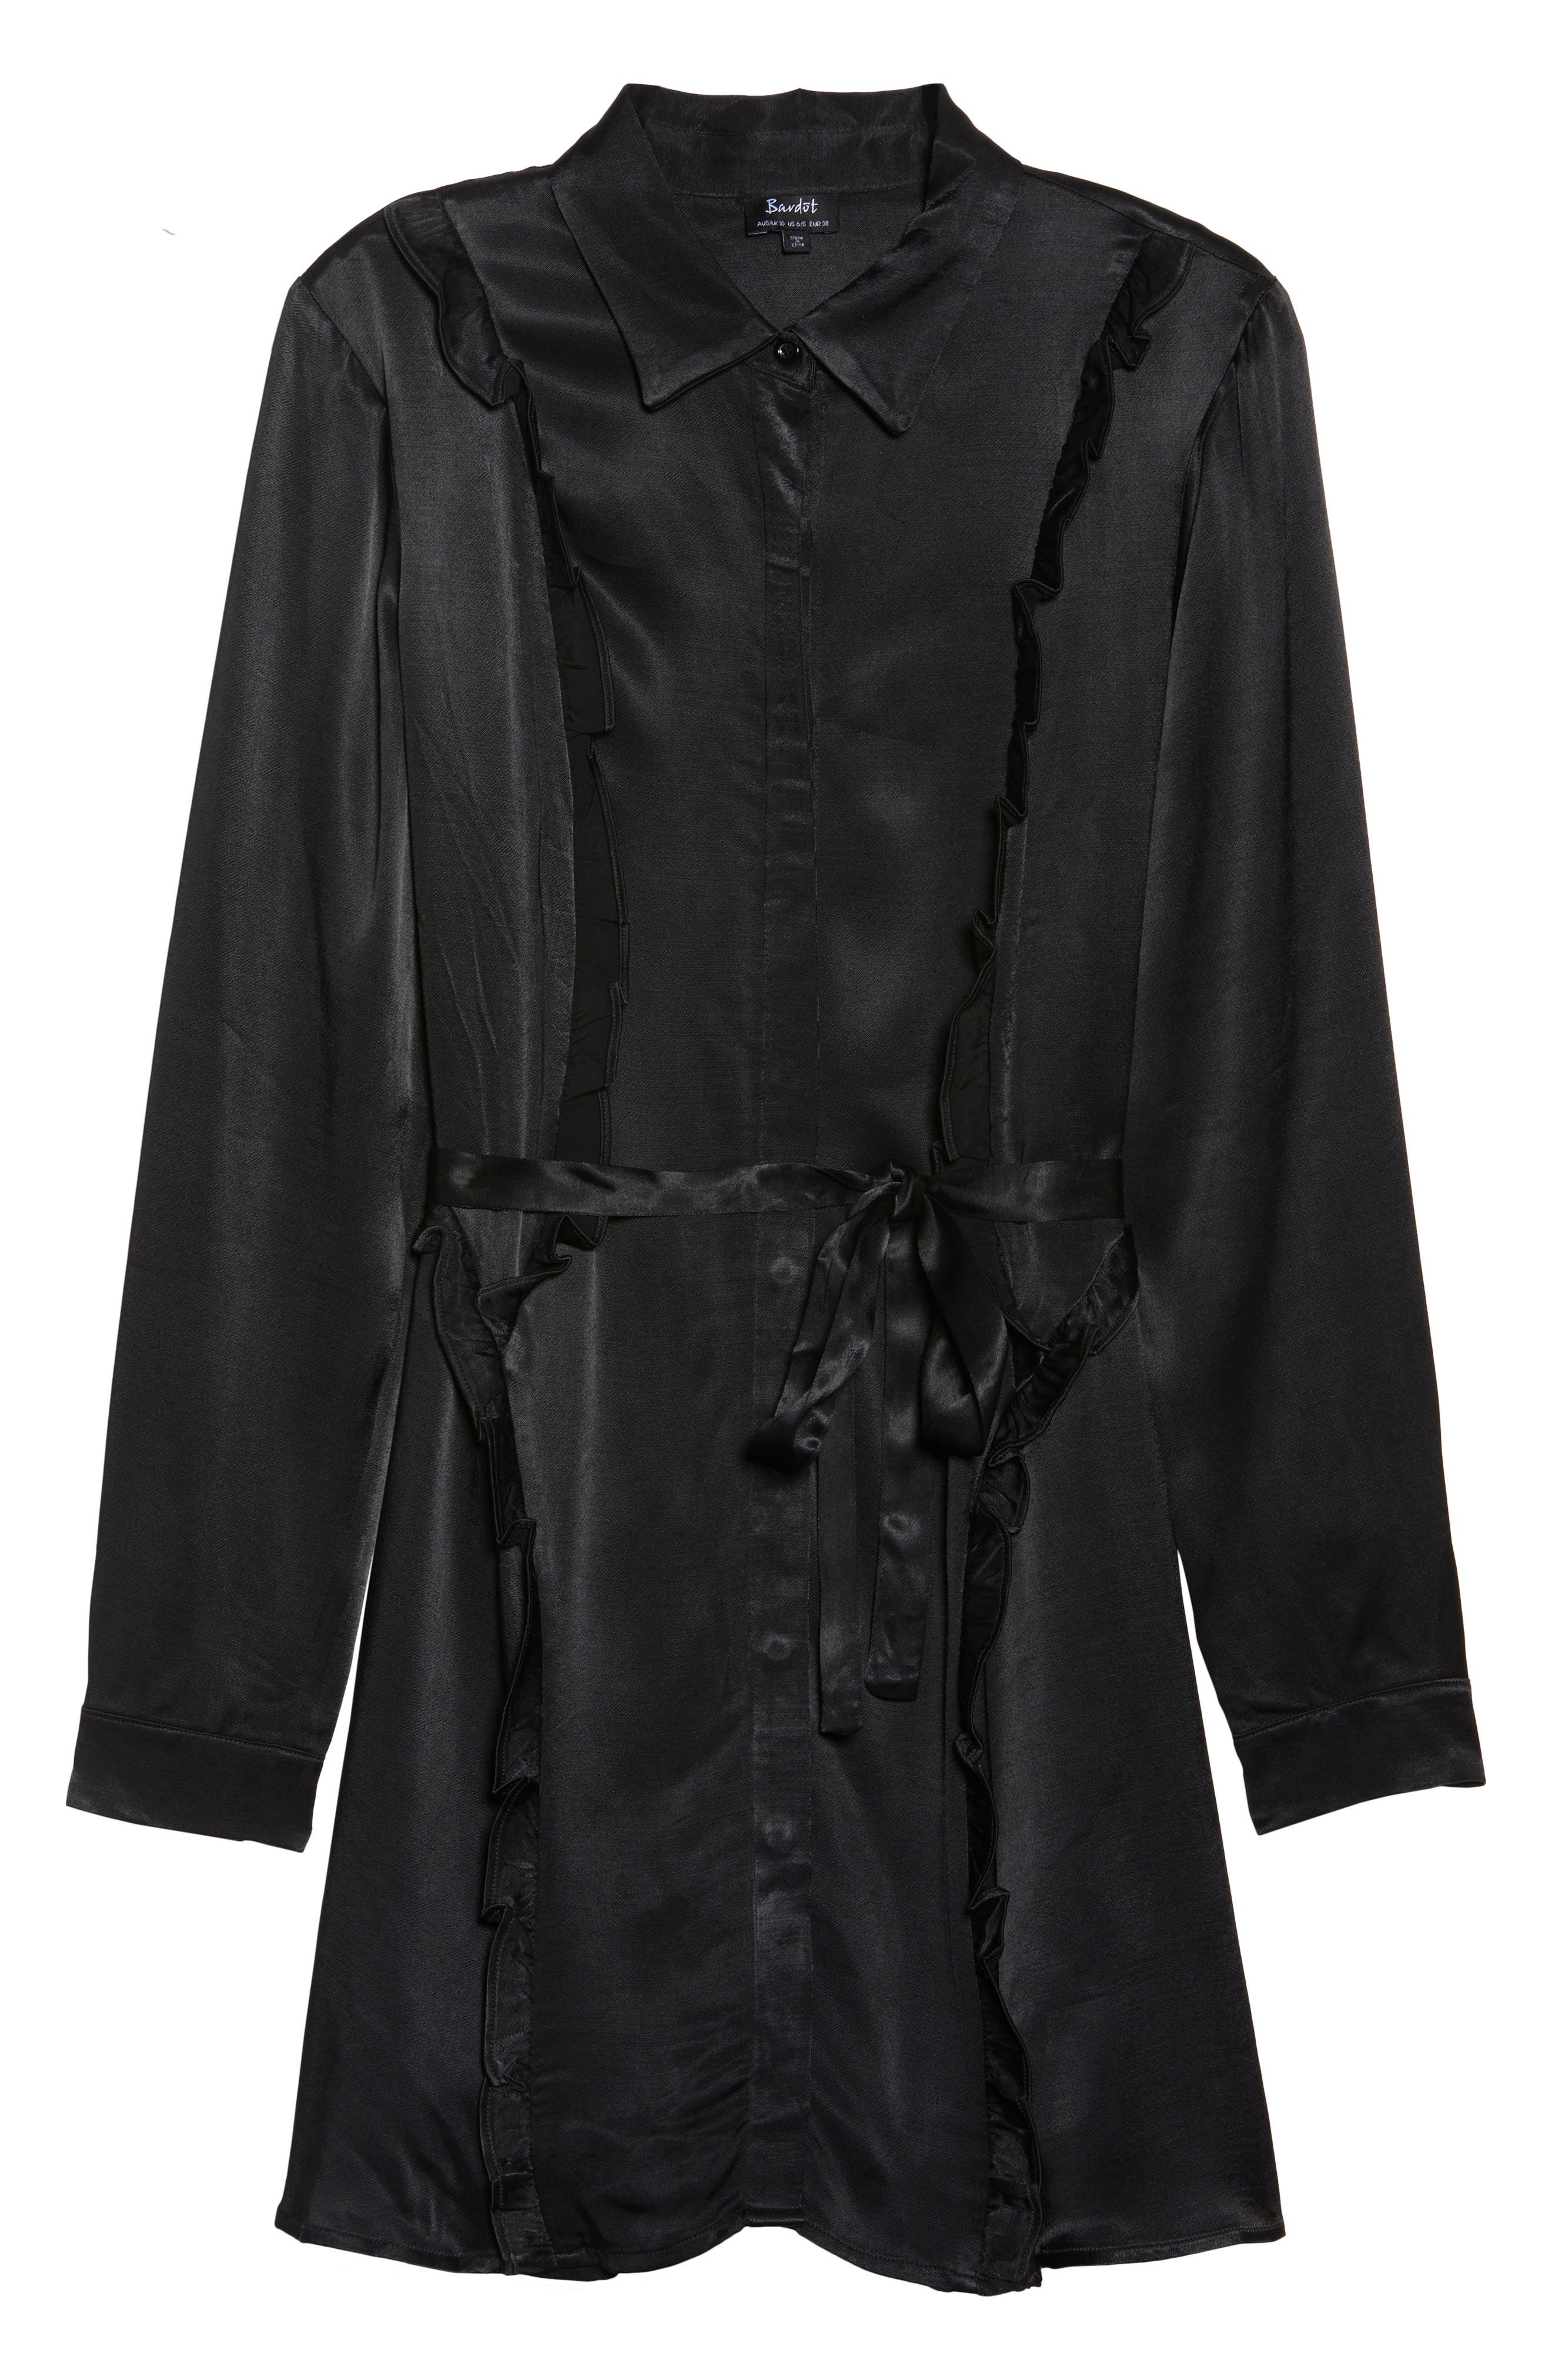 Cassia Ruffle Trim Shirtdress,                             Alternate thumbnail 6, color,                             Black